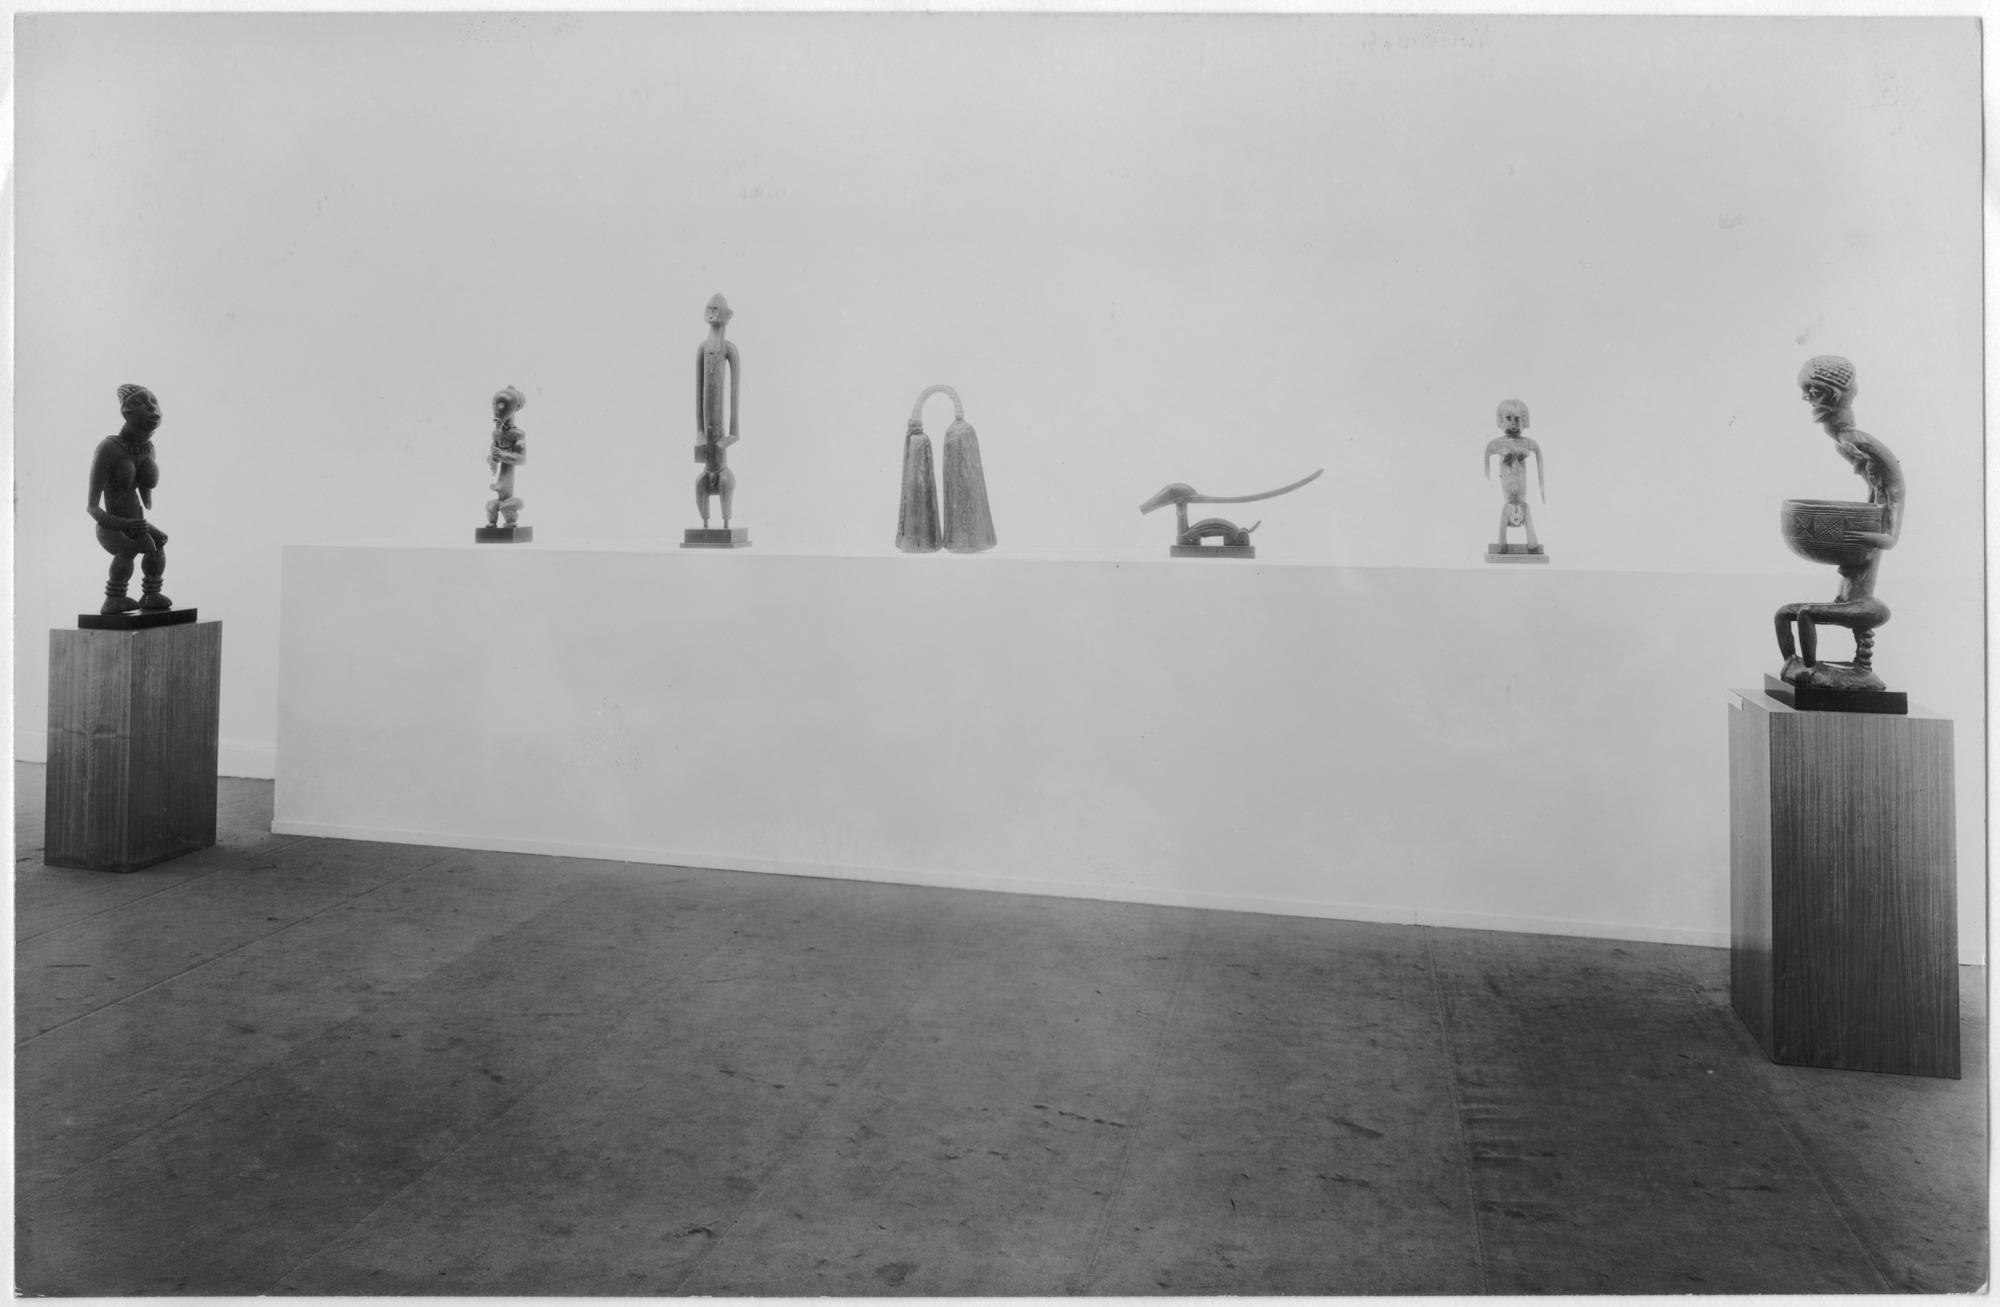 Image courtesy of the MoMA.